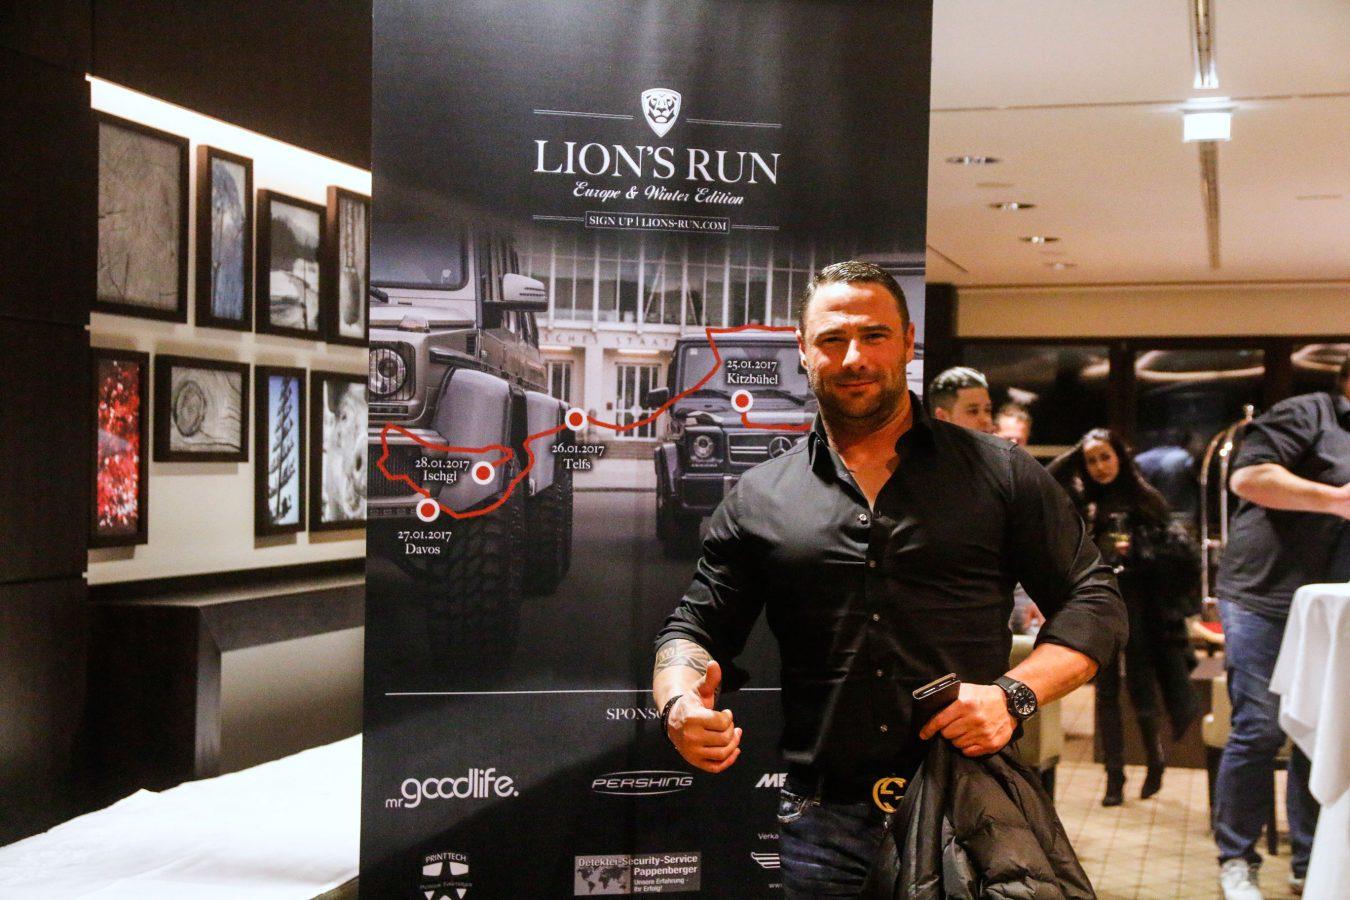 Lions_Run_winter_edition-2017_176-1